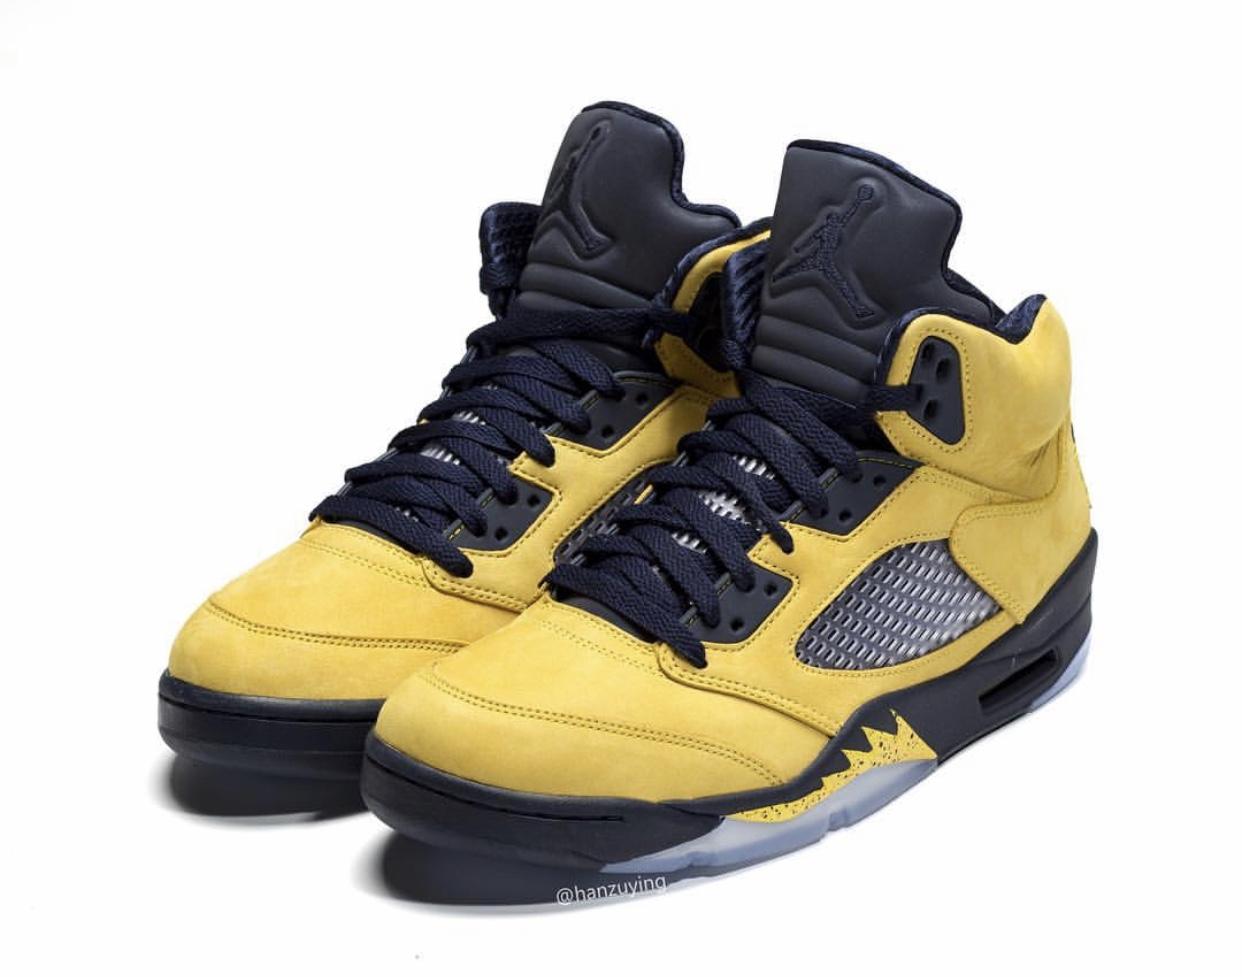 Air Jordan 5,发售  DJ Khaled 收藏的天价 AJ5 迎来市售 !密歇根配色八月发售